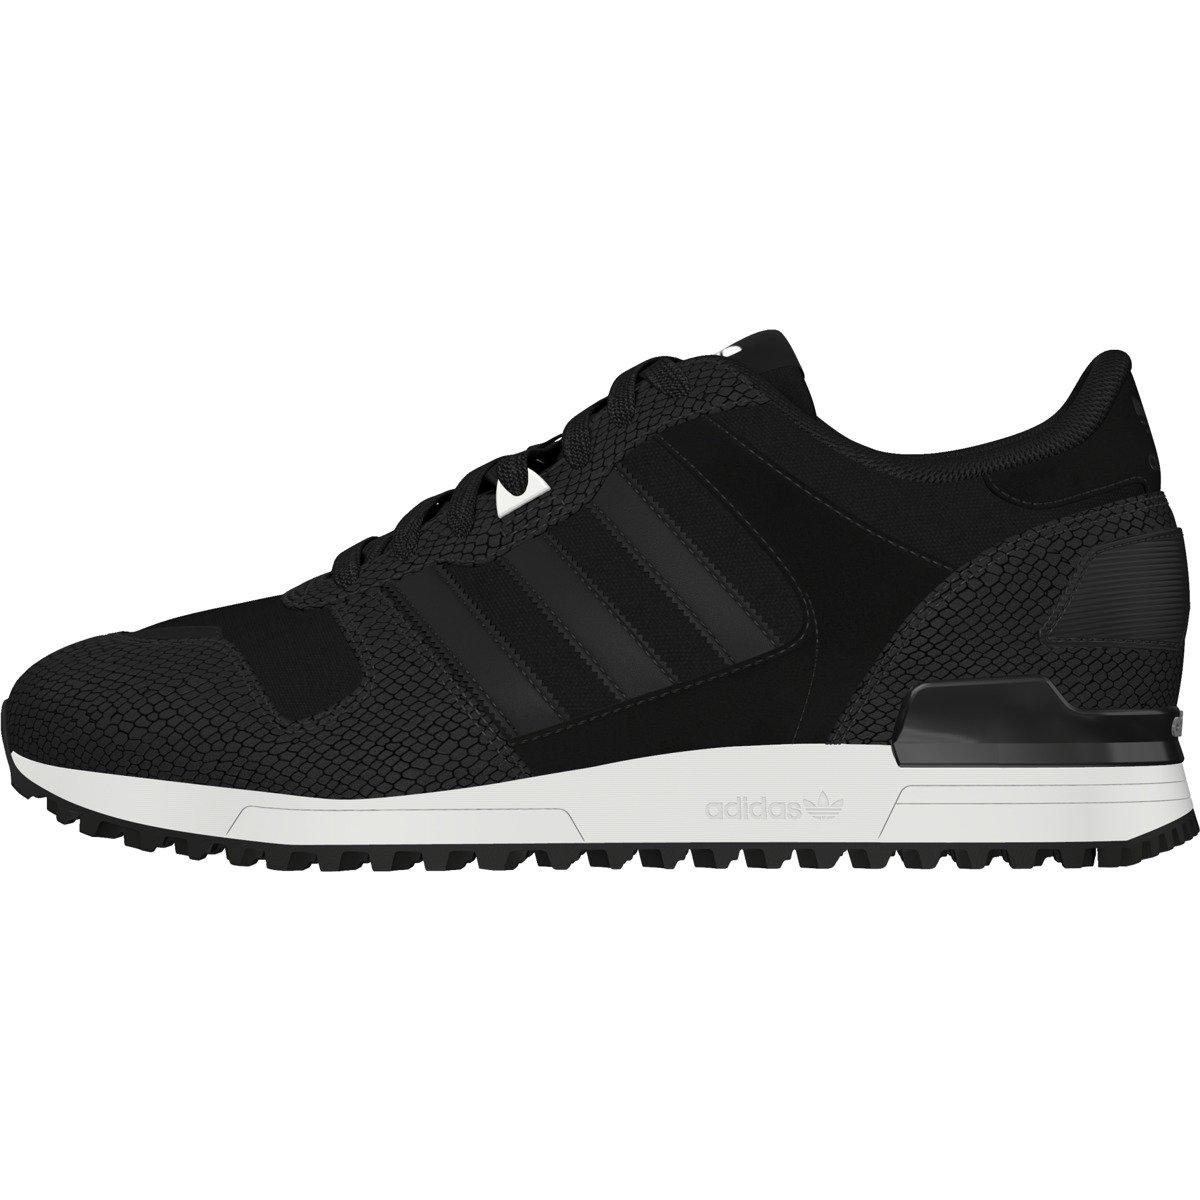 adidas zx 700 w shoes ba9981 basketball shoes sklep. Black Bedroom Furniture Sets. Home Design Ideas